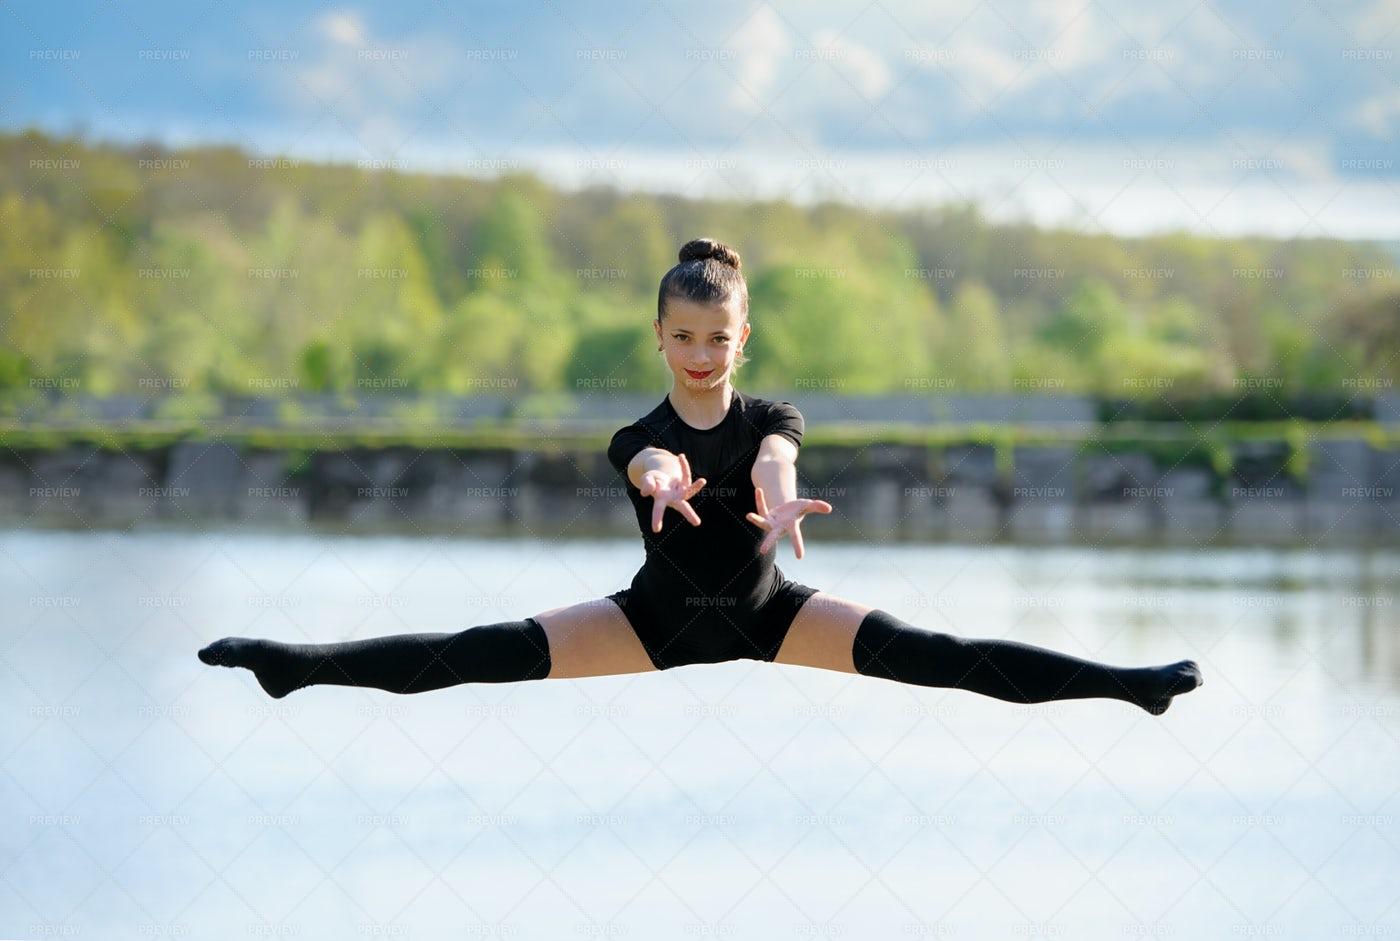 Gymnast In The Air: Stock Photos